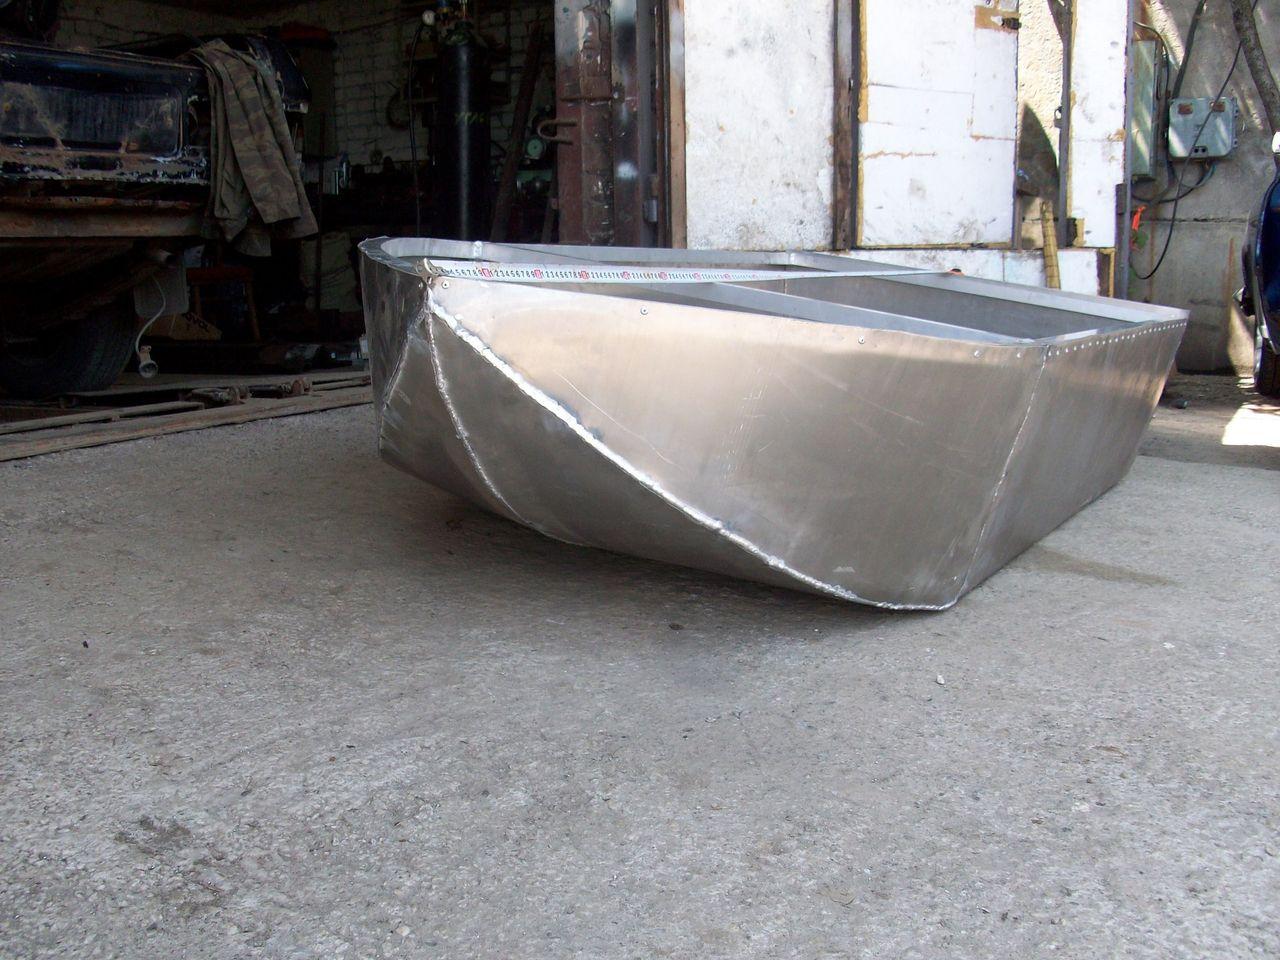 Моторная лодка своими руками из оцинковки 34